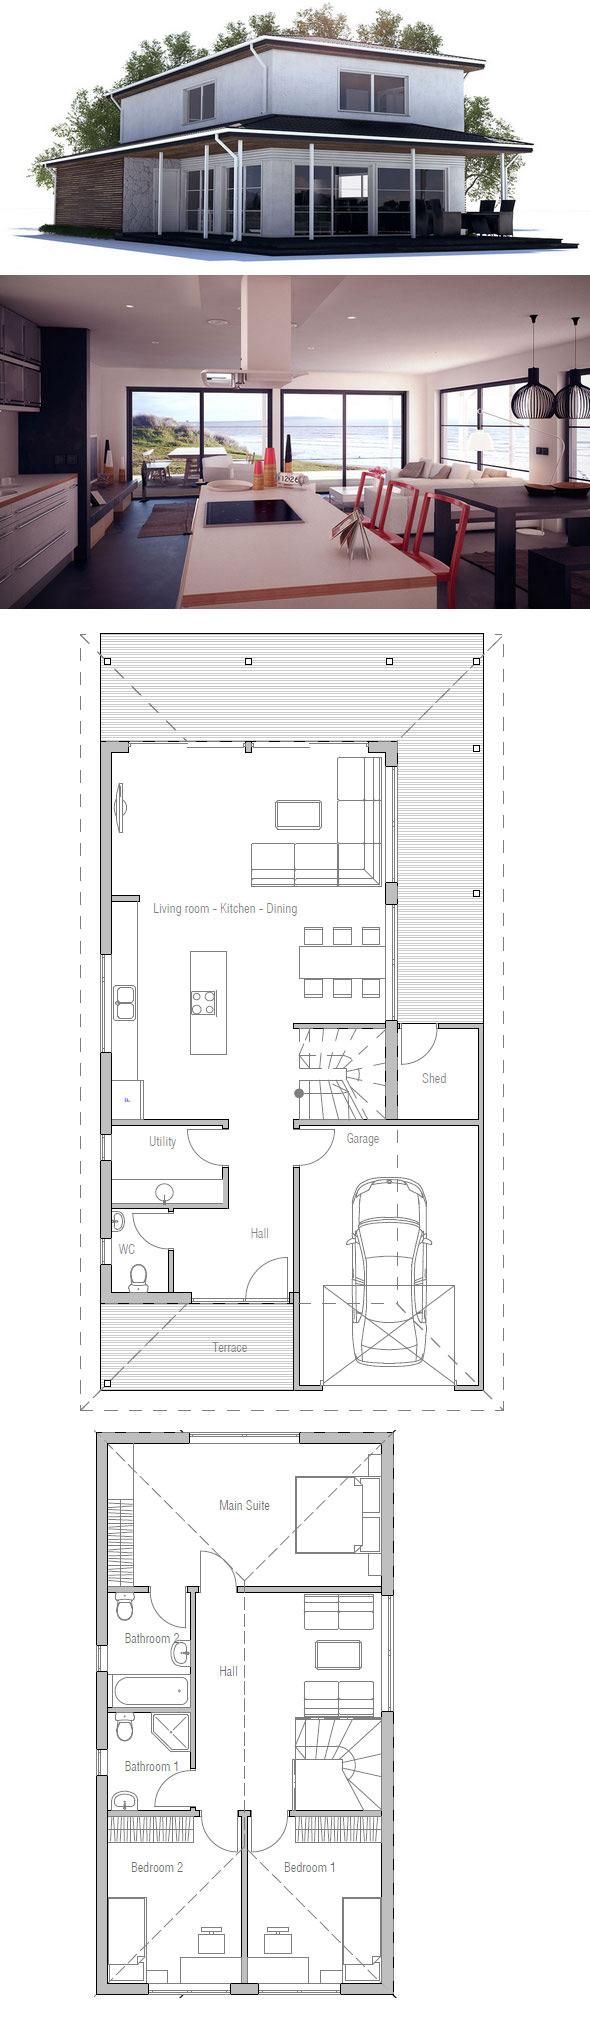 House Plans U0026 Home Plans | House Plans U0026 House Designs